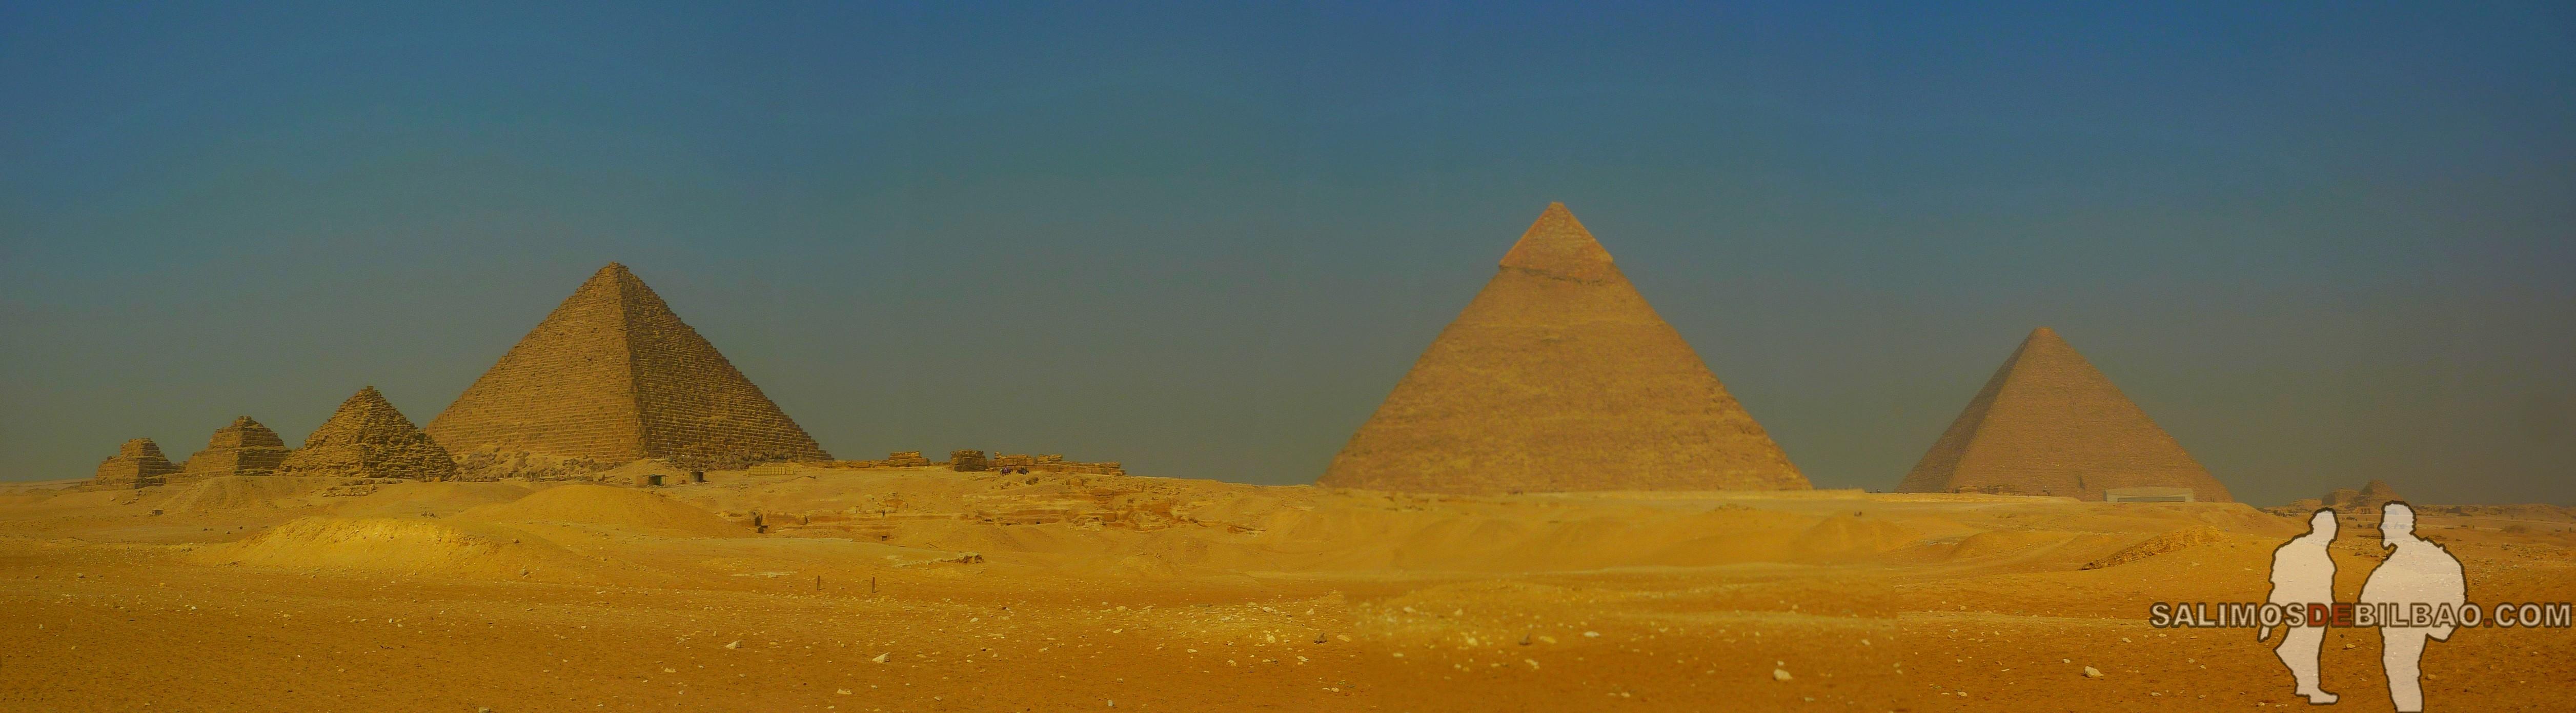 0095. Pano, Pirámides de Giza